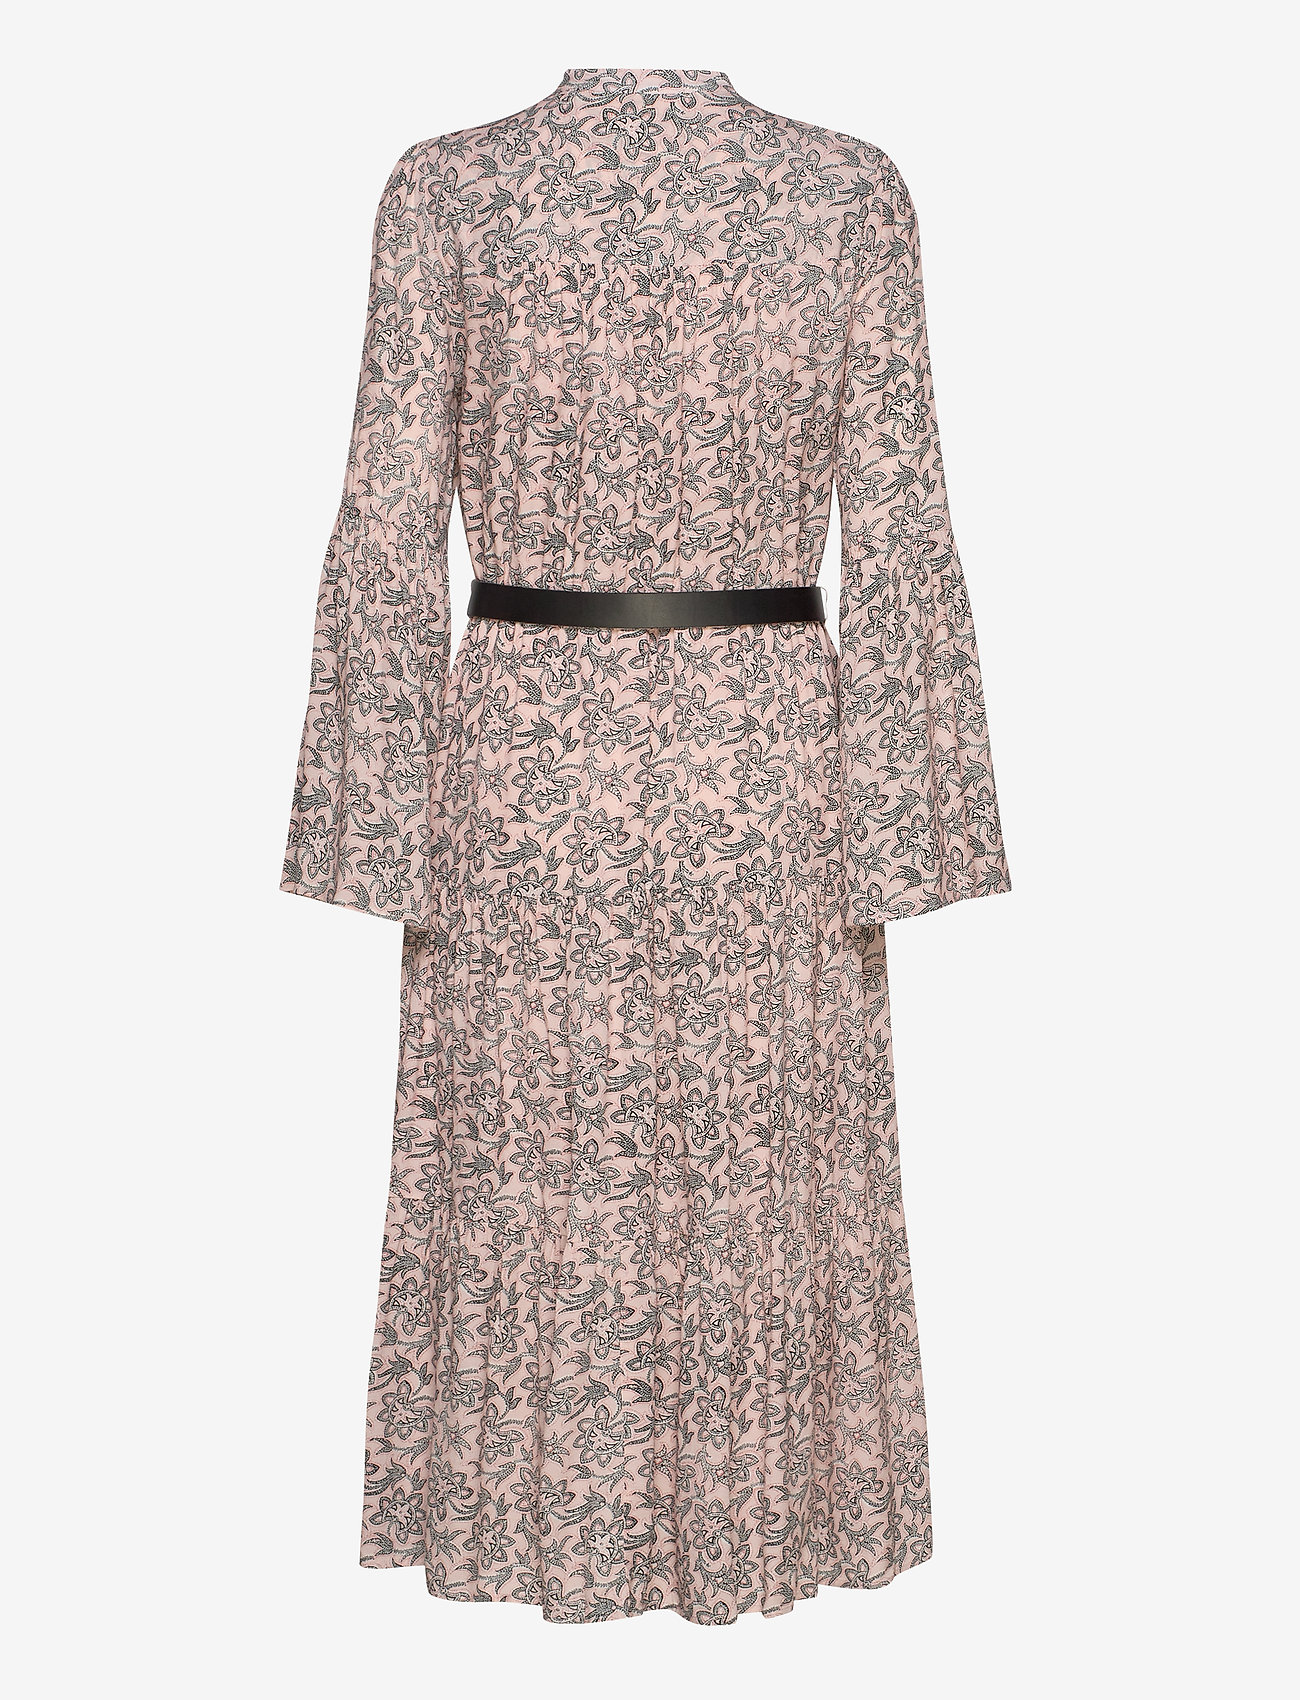 Michael Kors - LEAFY MEDL MIDI DRESS - alledaagse jurken - powder blush - 1